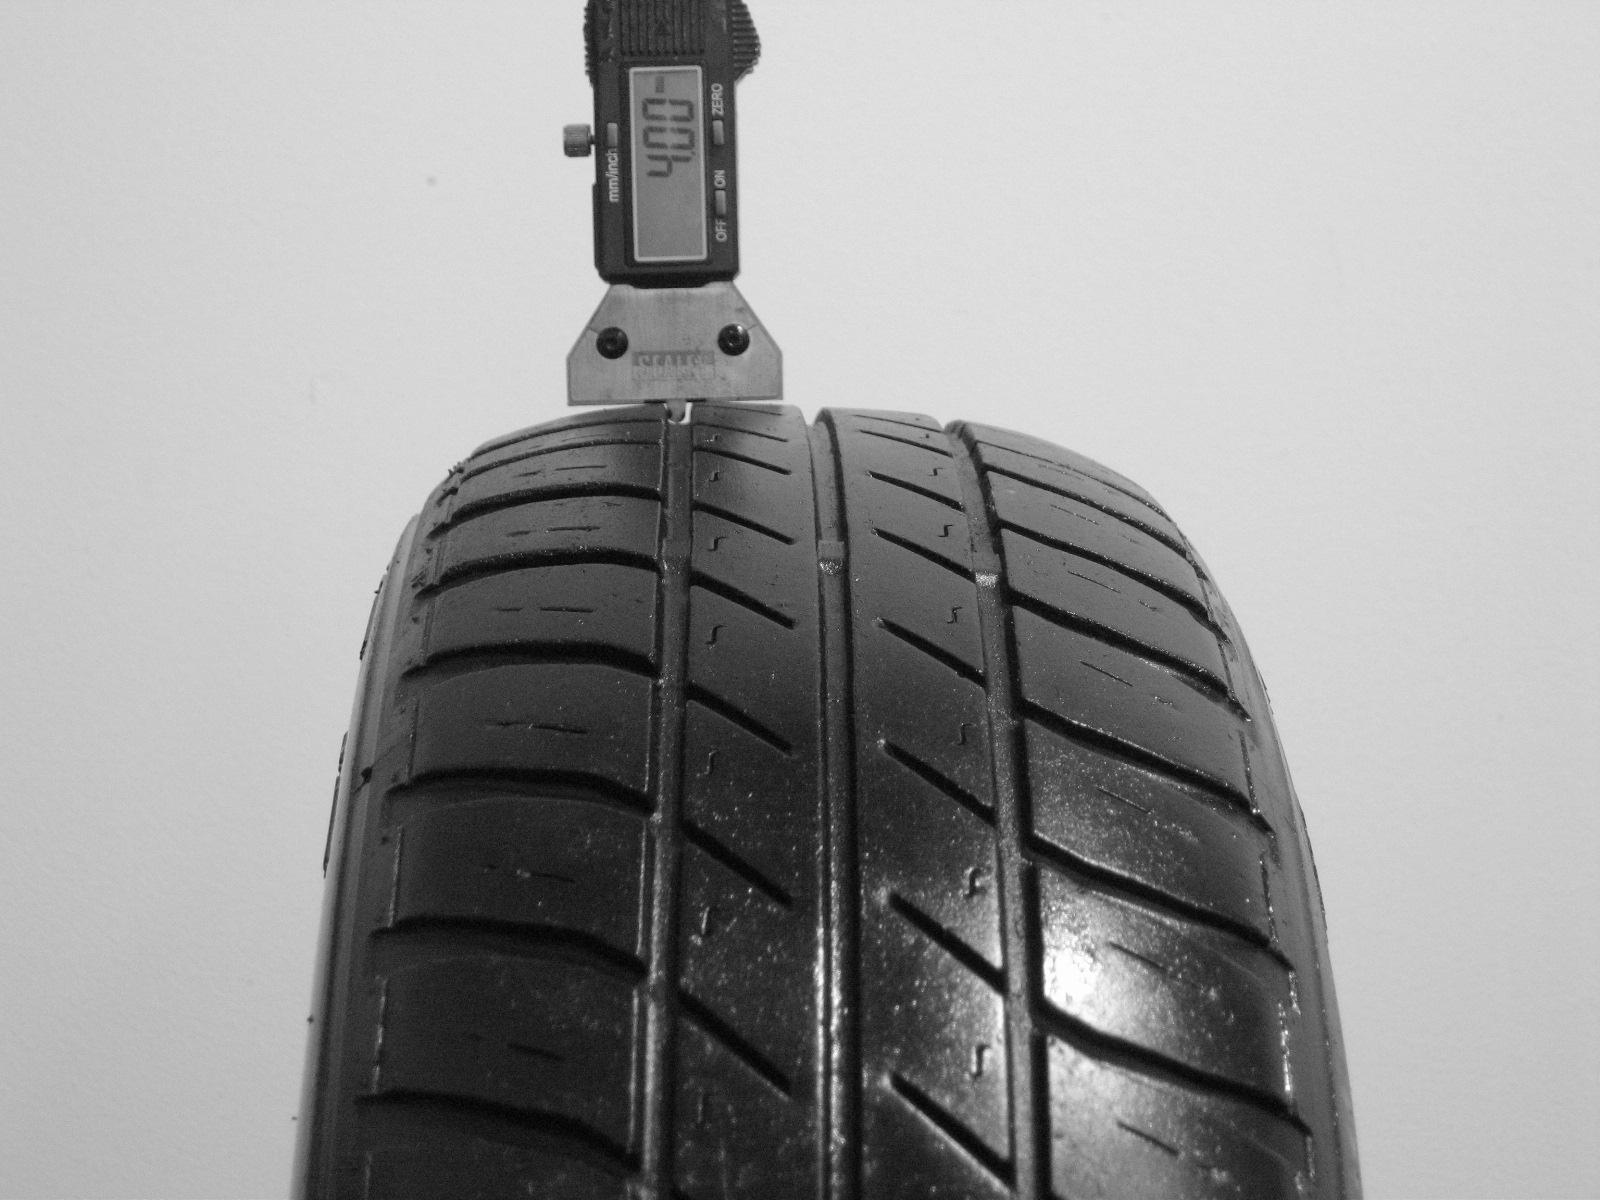 Použité-Pneu-Bazar - 175/70 R13 BARUM BRILANT OR57 -kusovka-rezerva 3mm